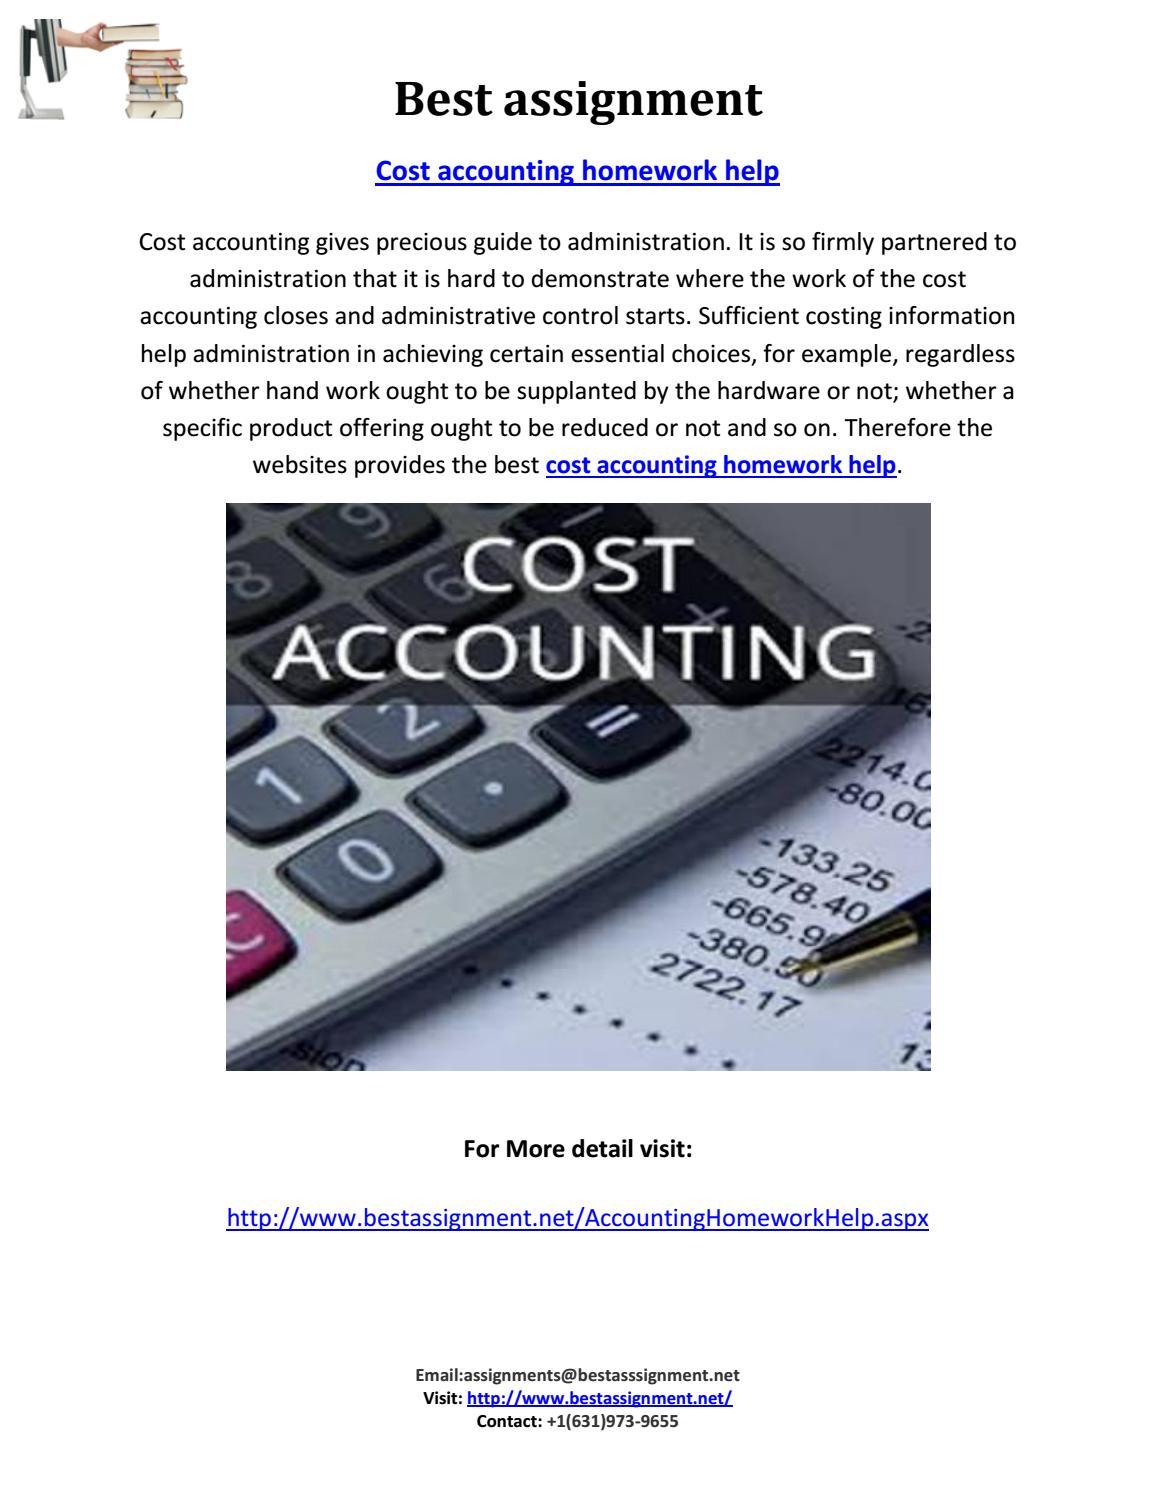 Cost Accounting Homework & Assignment help | My Homework Help